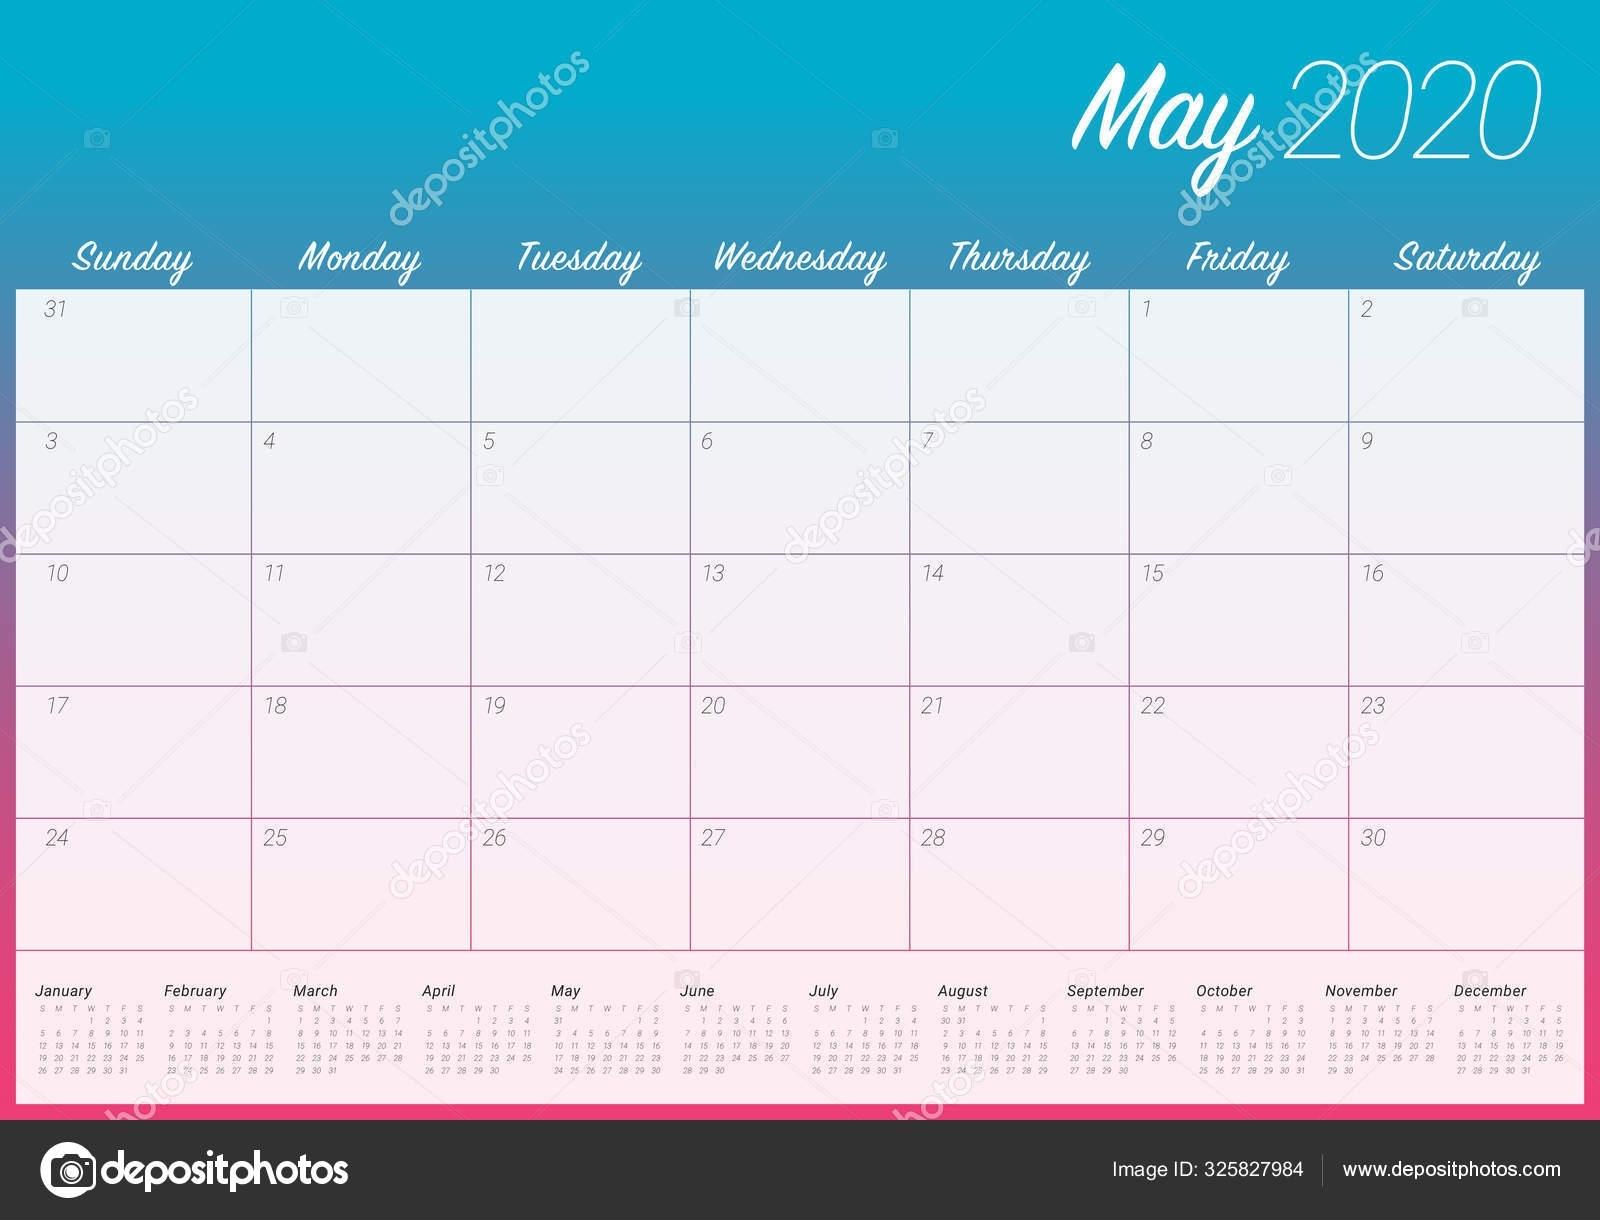 Depo 12 Week Calendar | Printable Calendar Template 2021